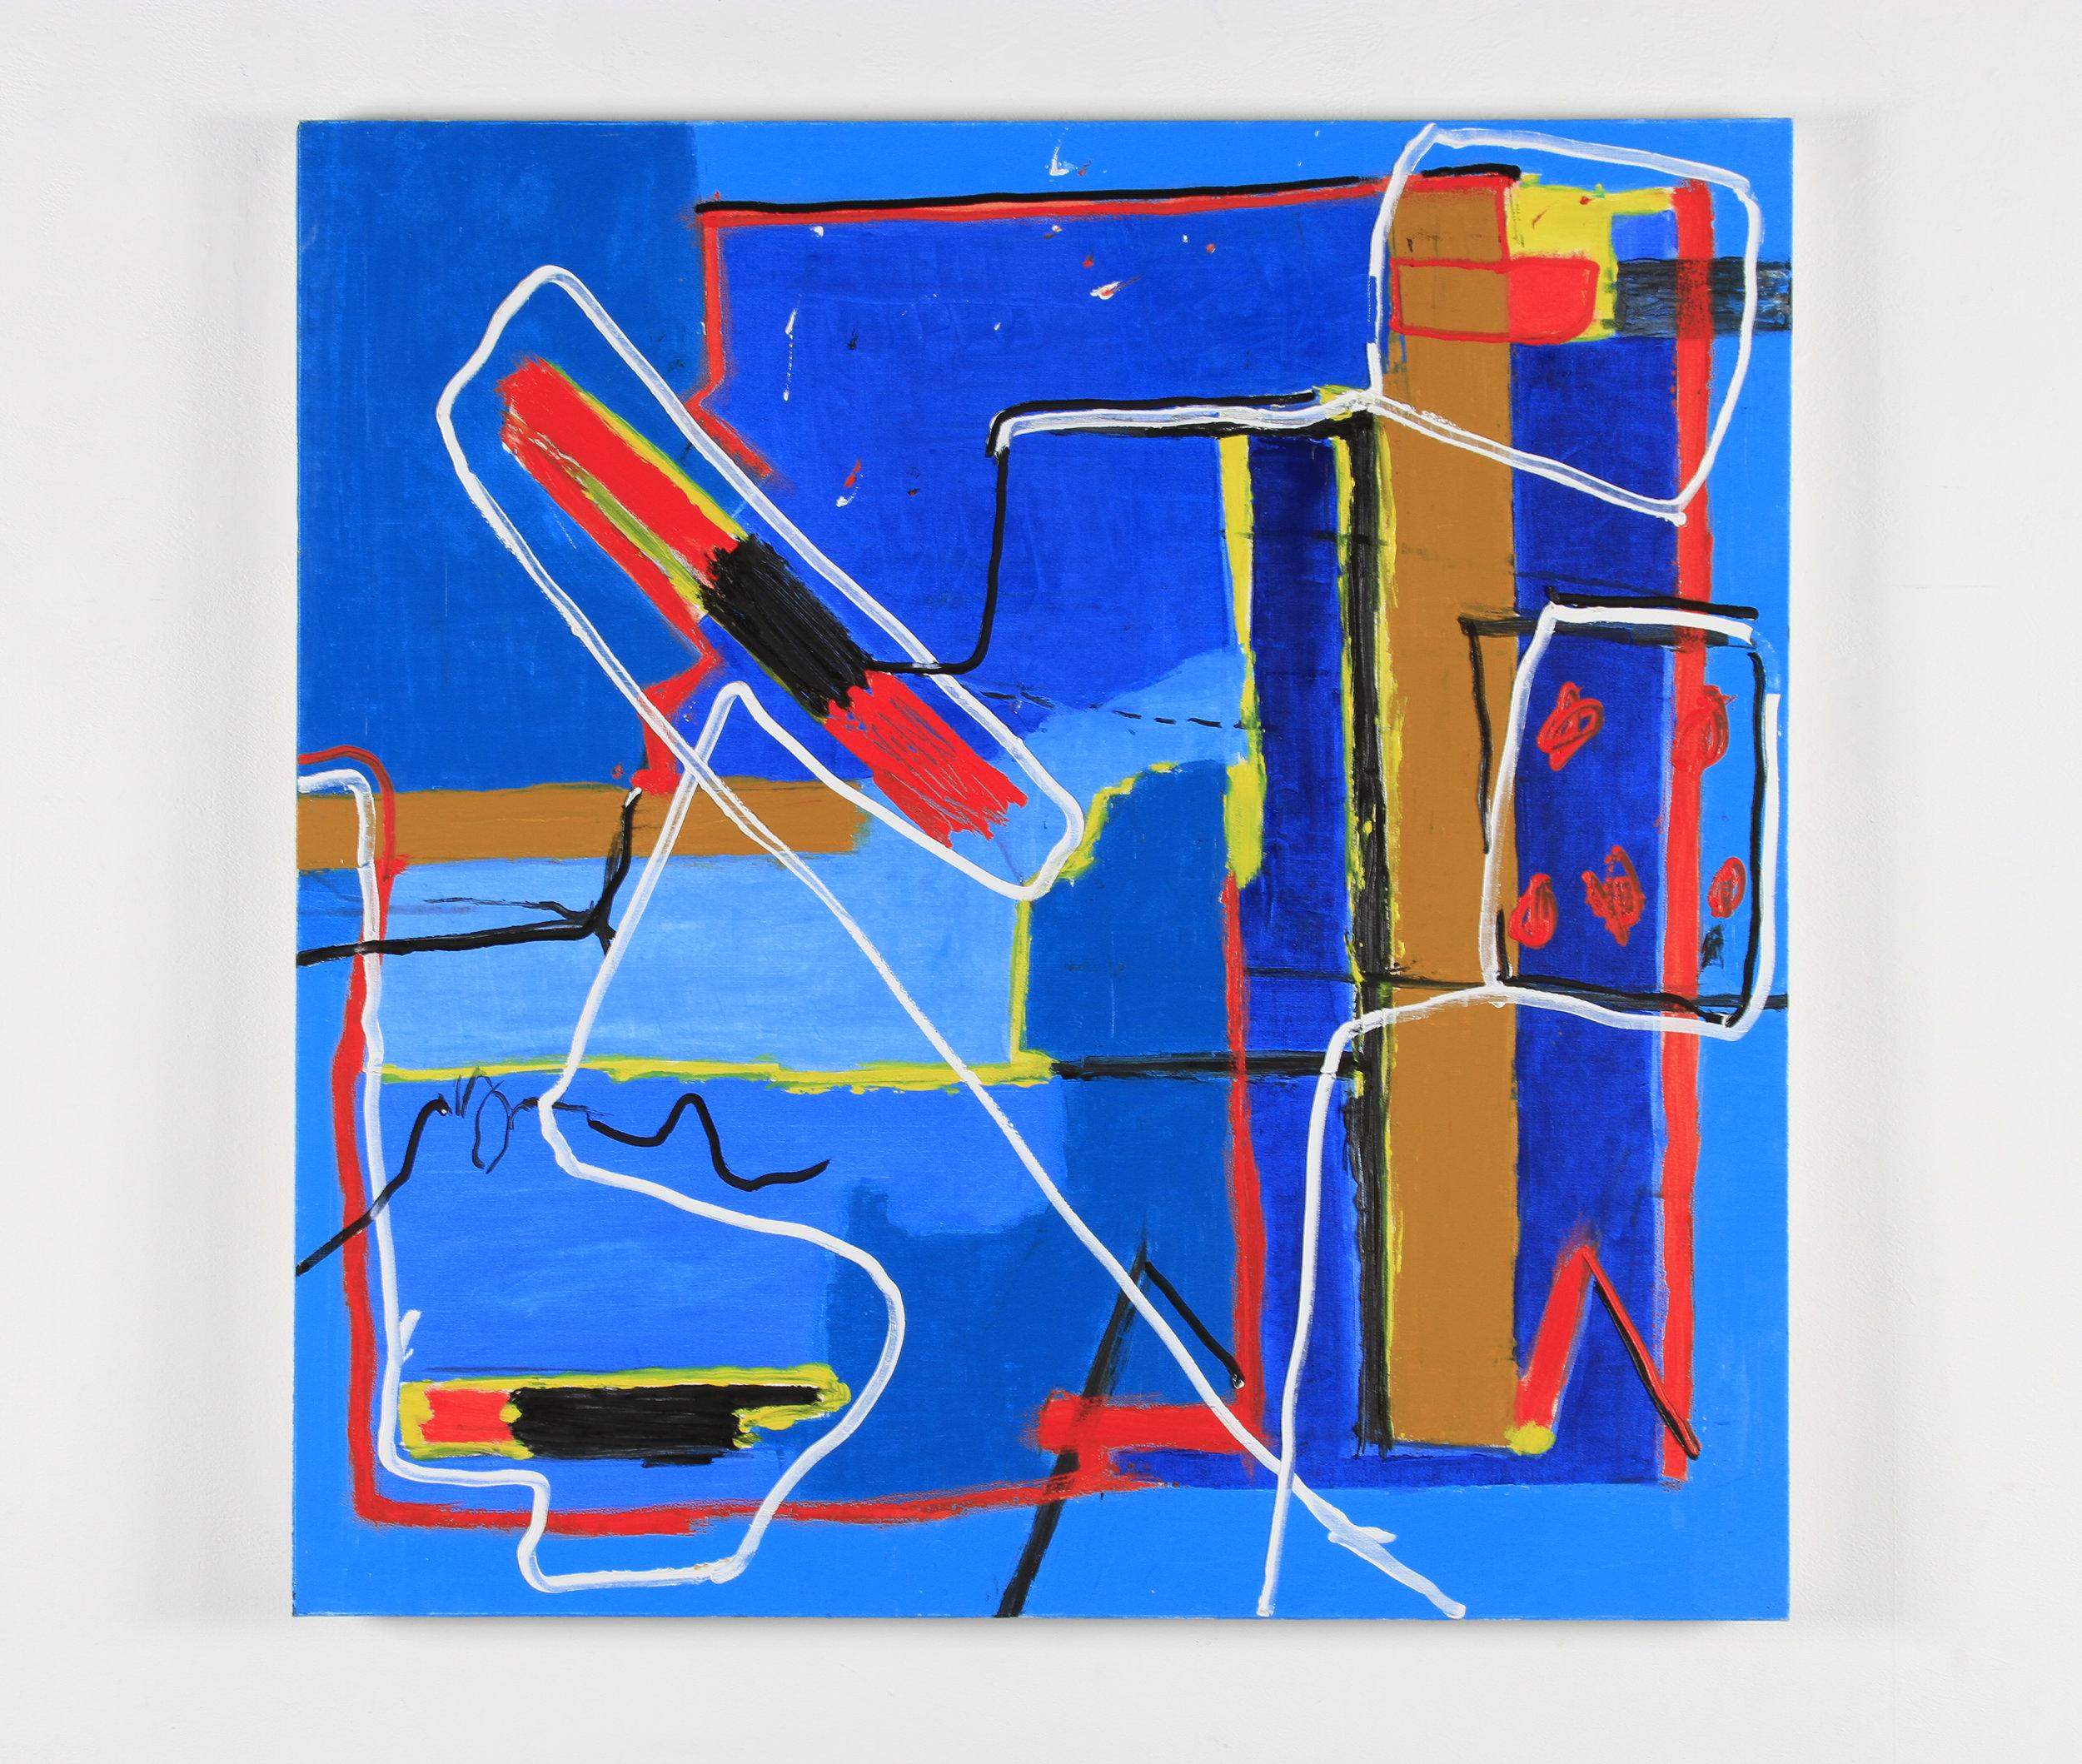 Gustavo Ramos Rivera, Purposeful Ramble, 2015, oil on canvas, 48 x 48 inches